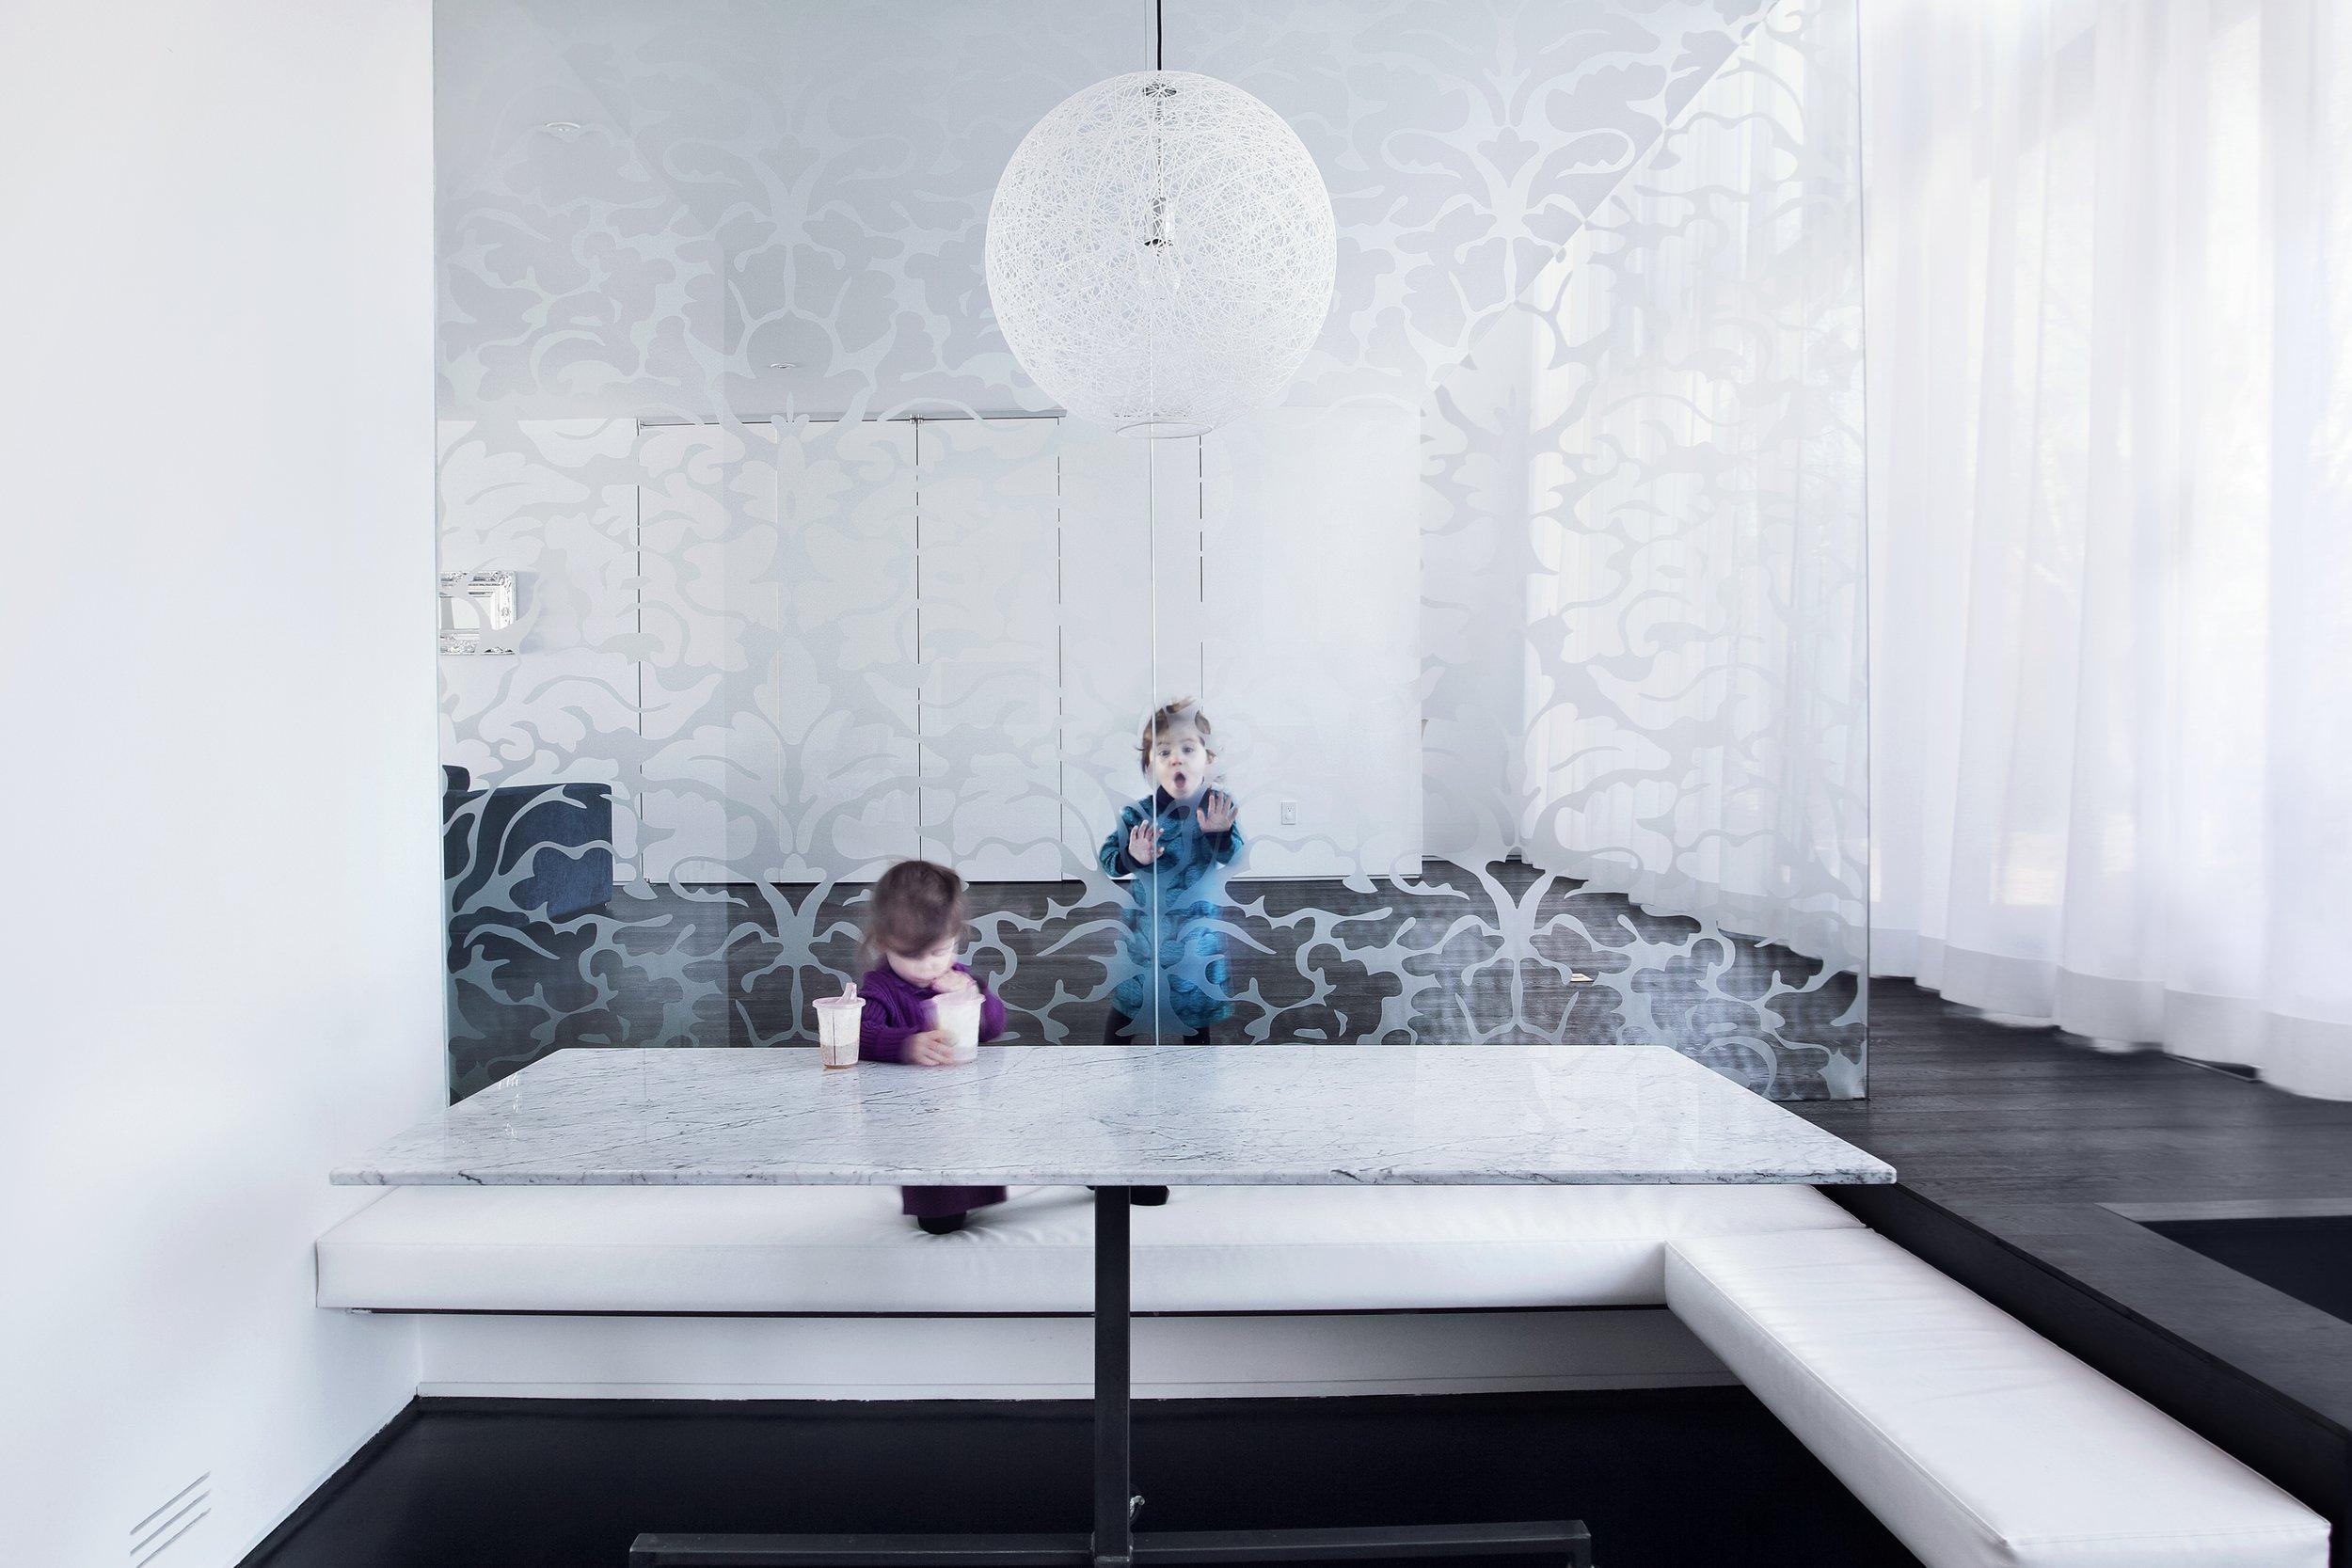 House 60 - kitchen table patterned glass pendant light bench